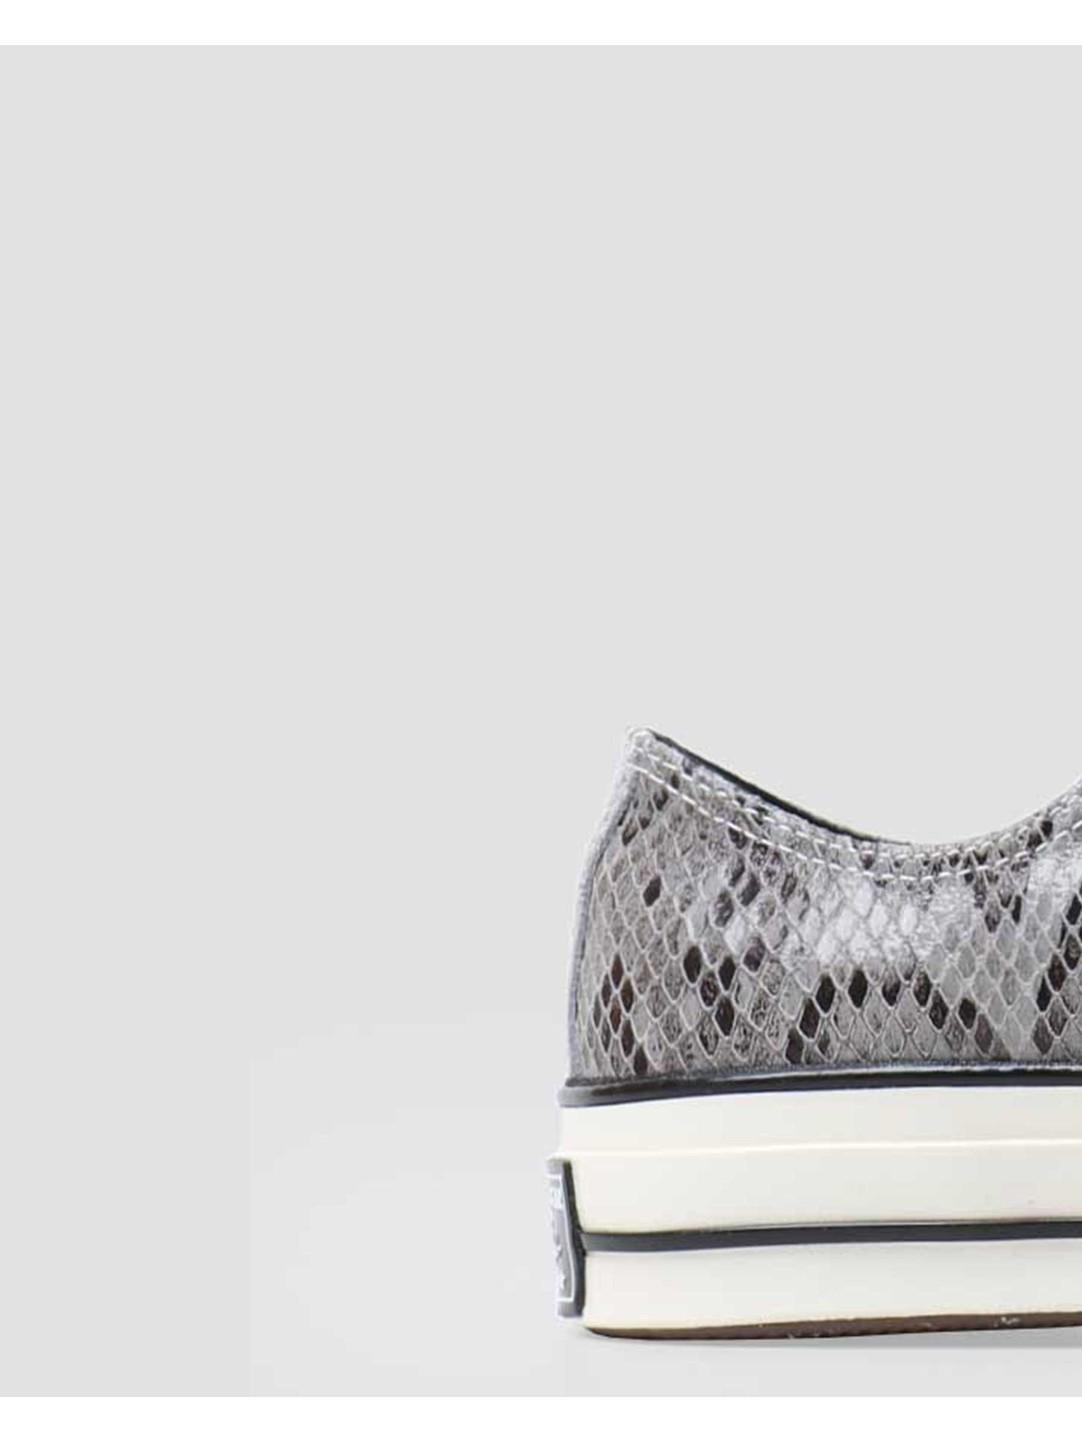 Converse Converse Chuck 70 HI Grey Leather 170104C